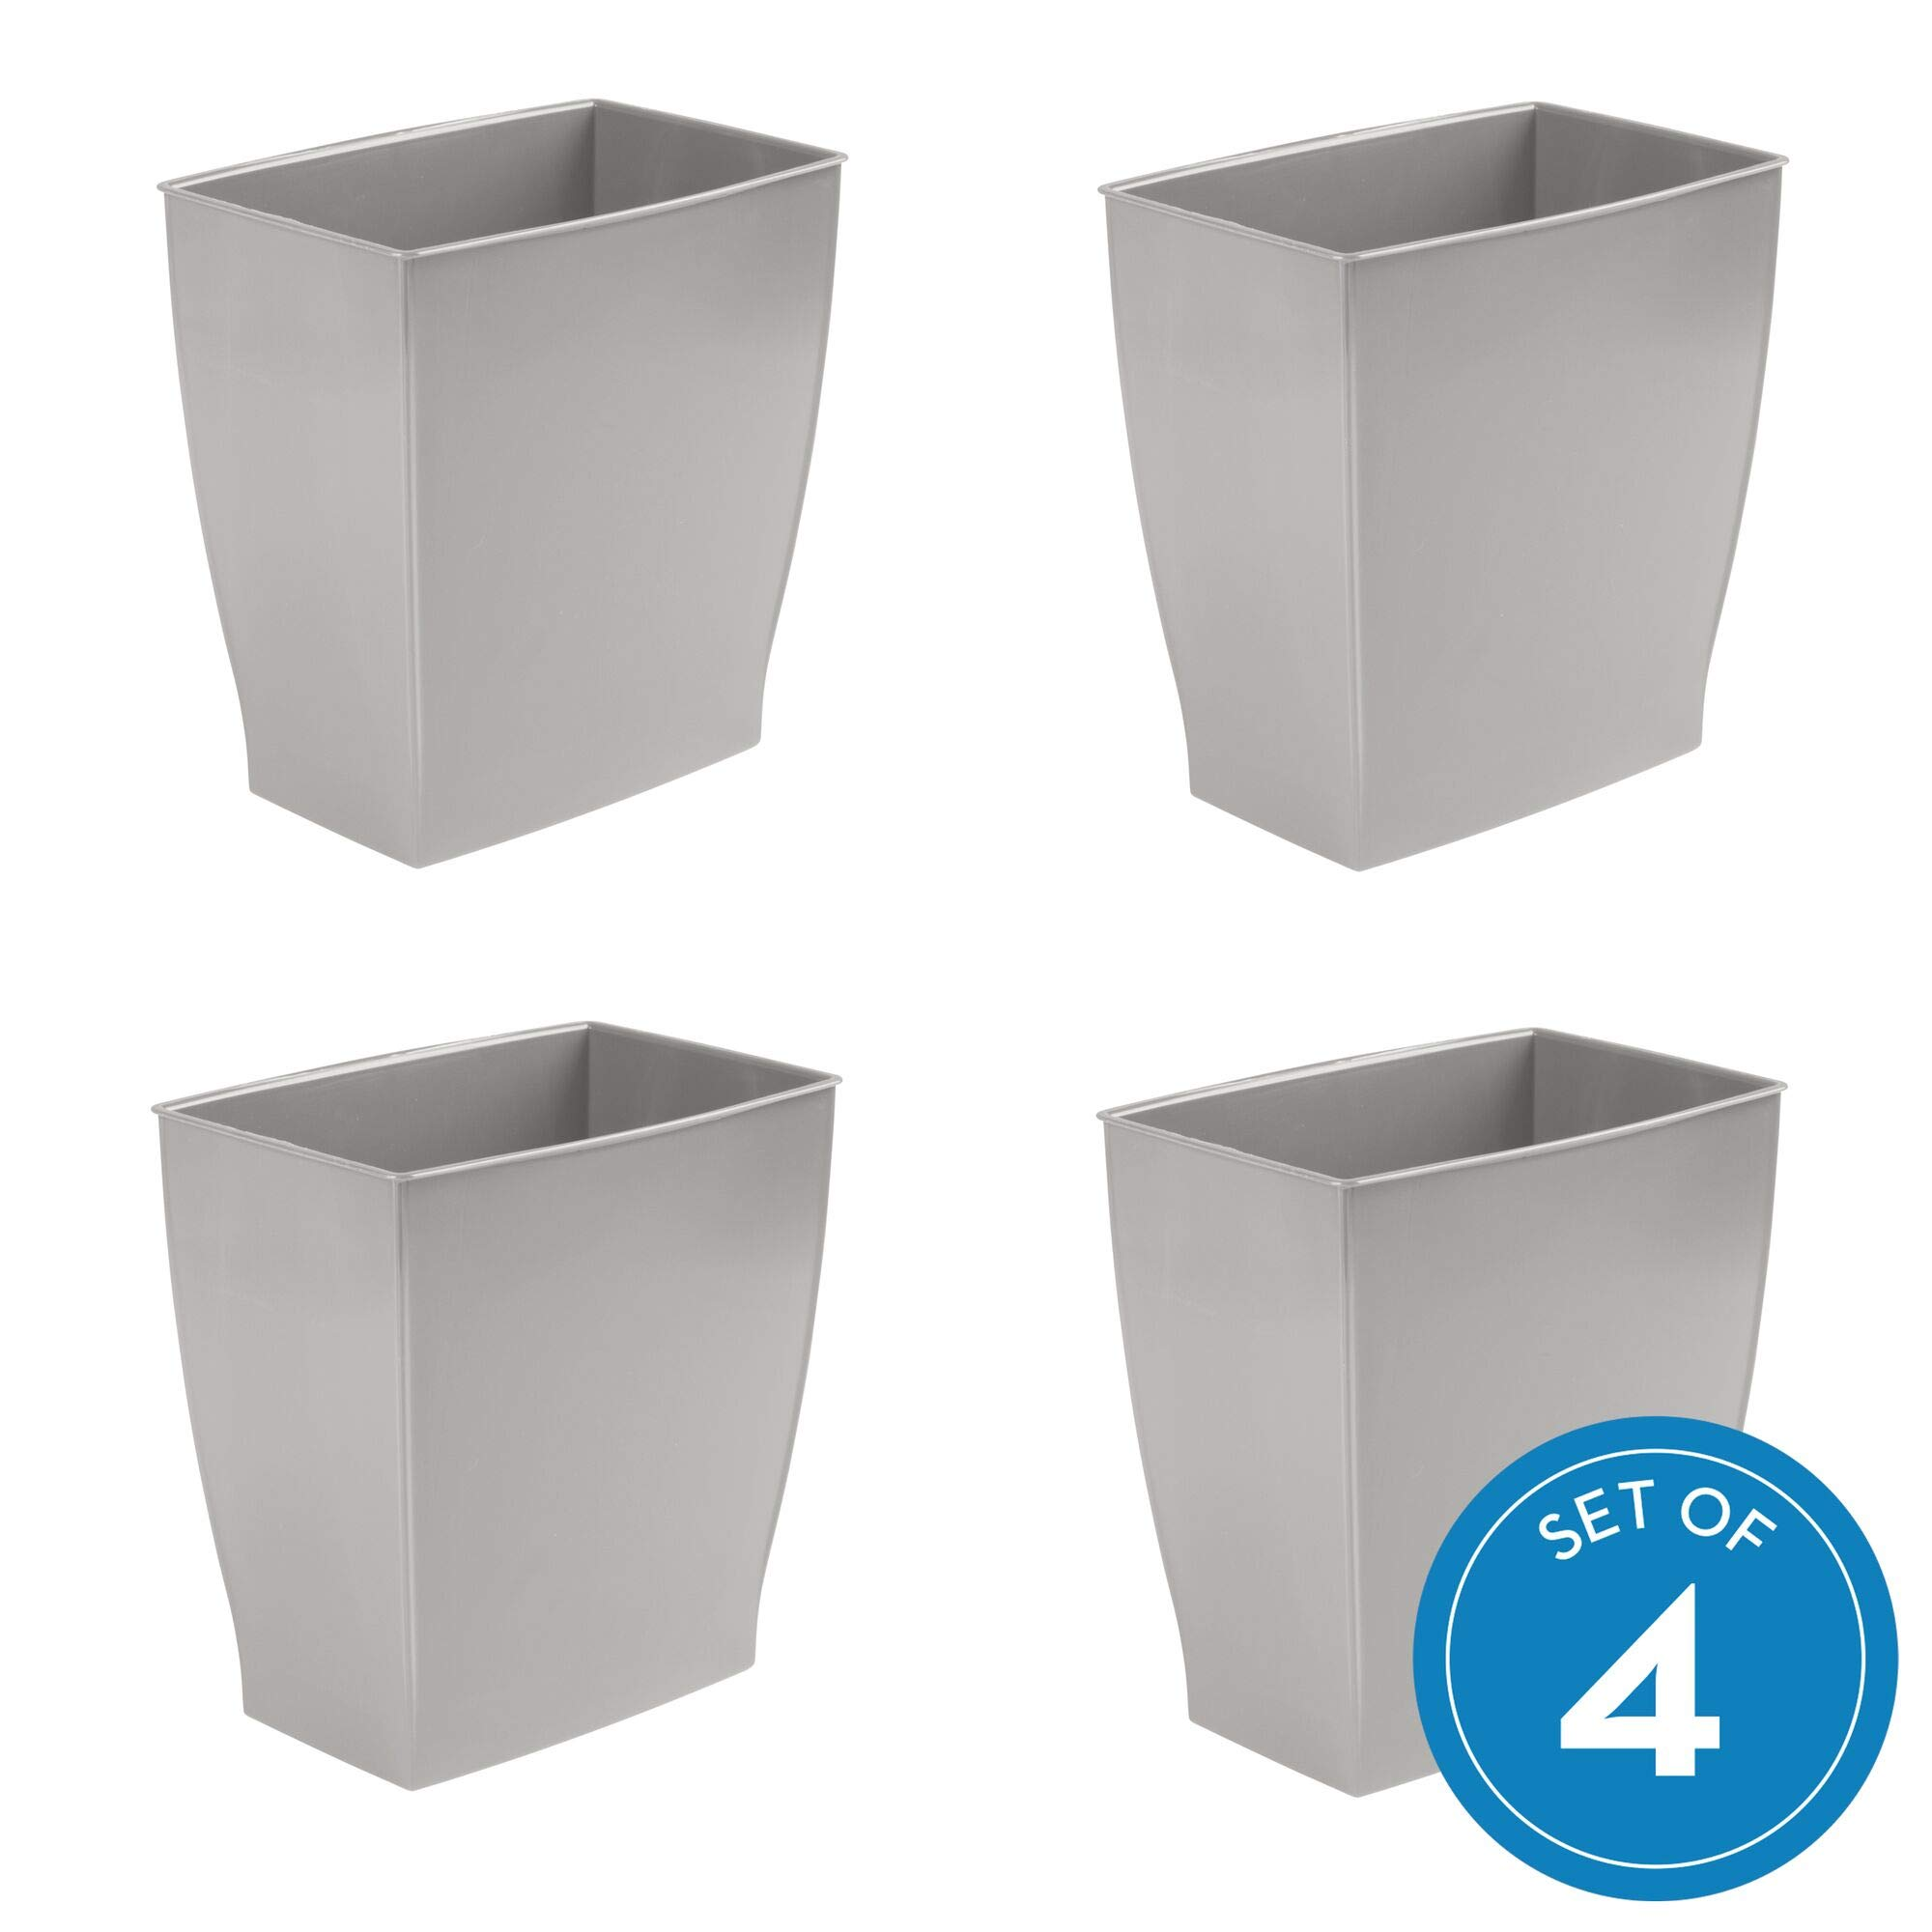 InterDesign Spa Mono Rectangular Trash Can, Waste Basket for Bathroom, Kitchen, Office - Set of 4,